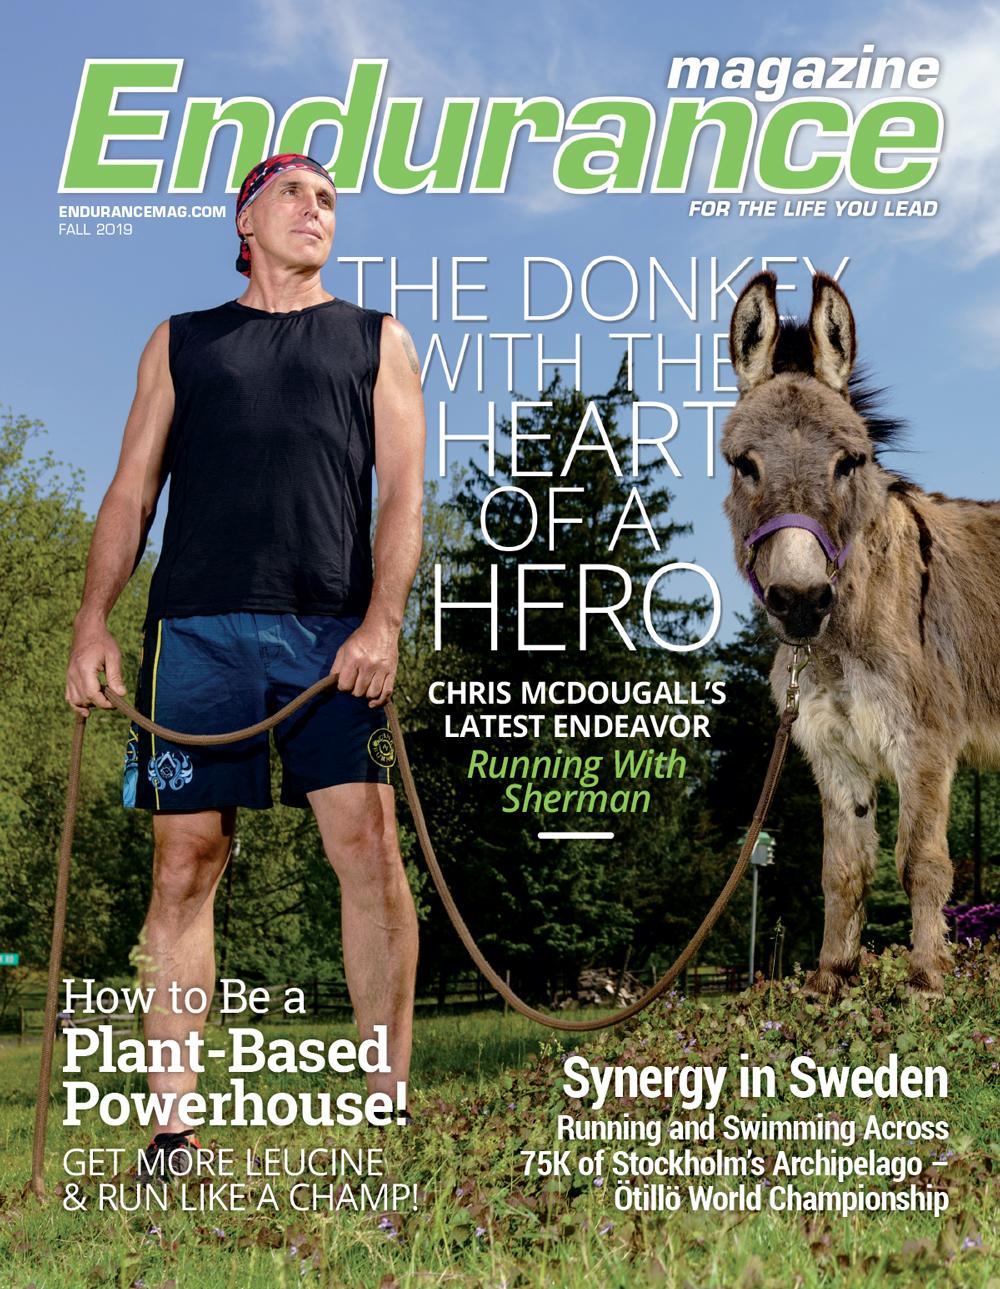 Endurance Fall 2019 cover